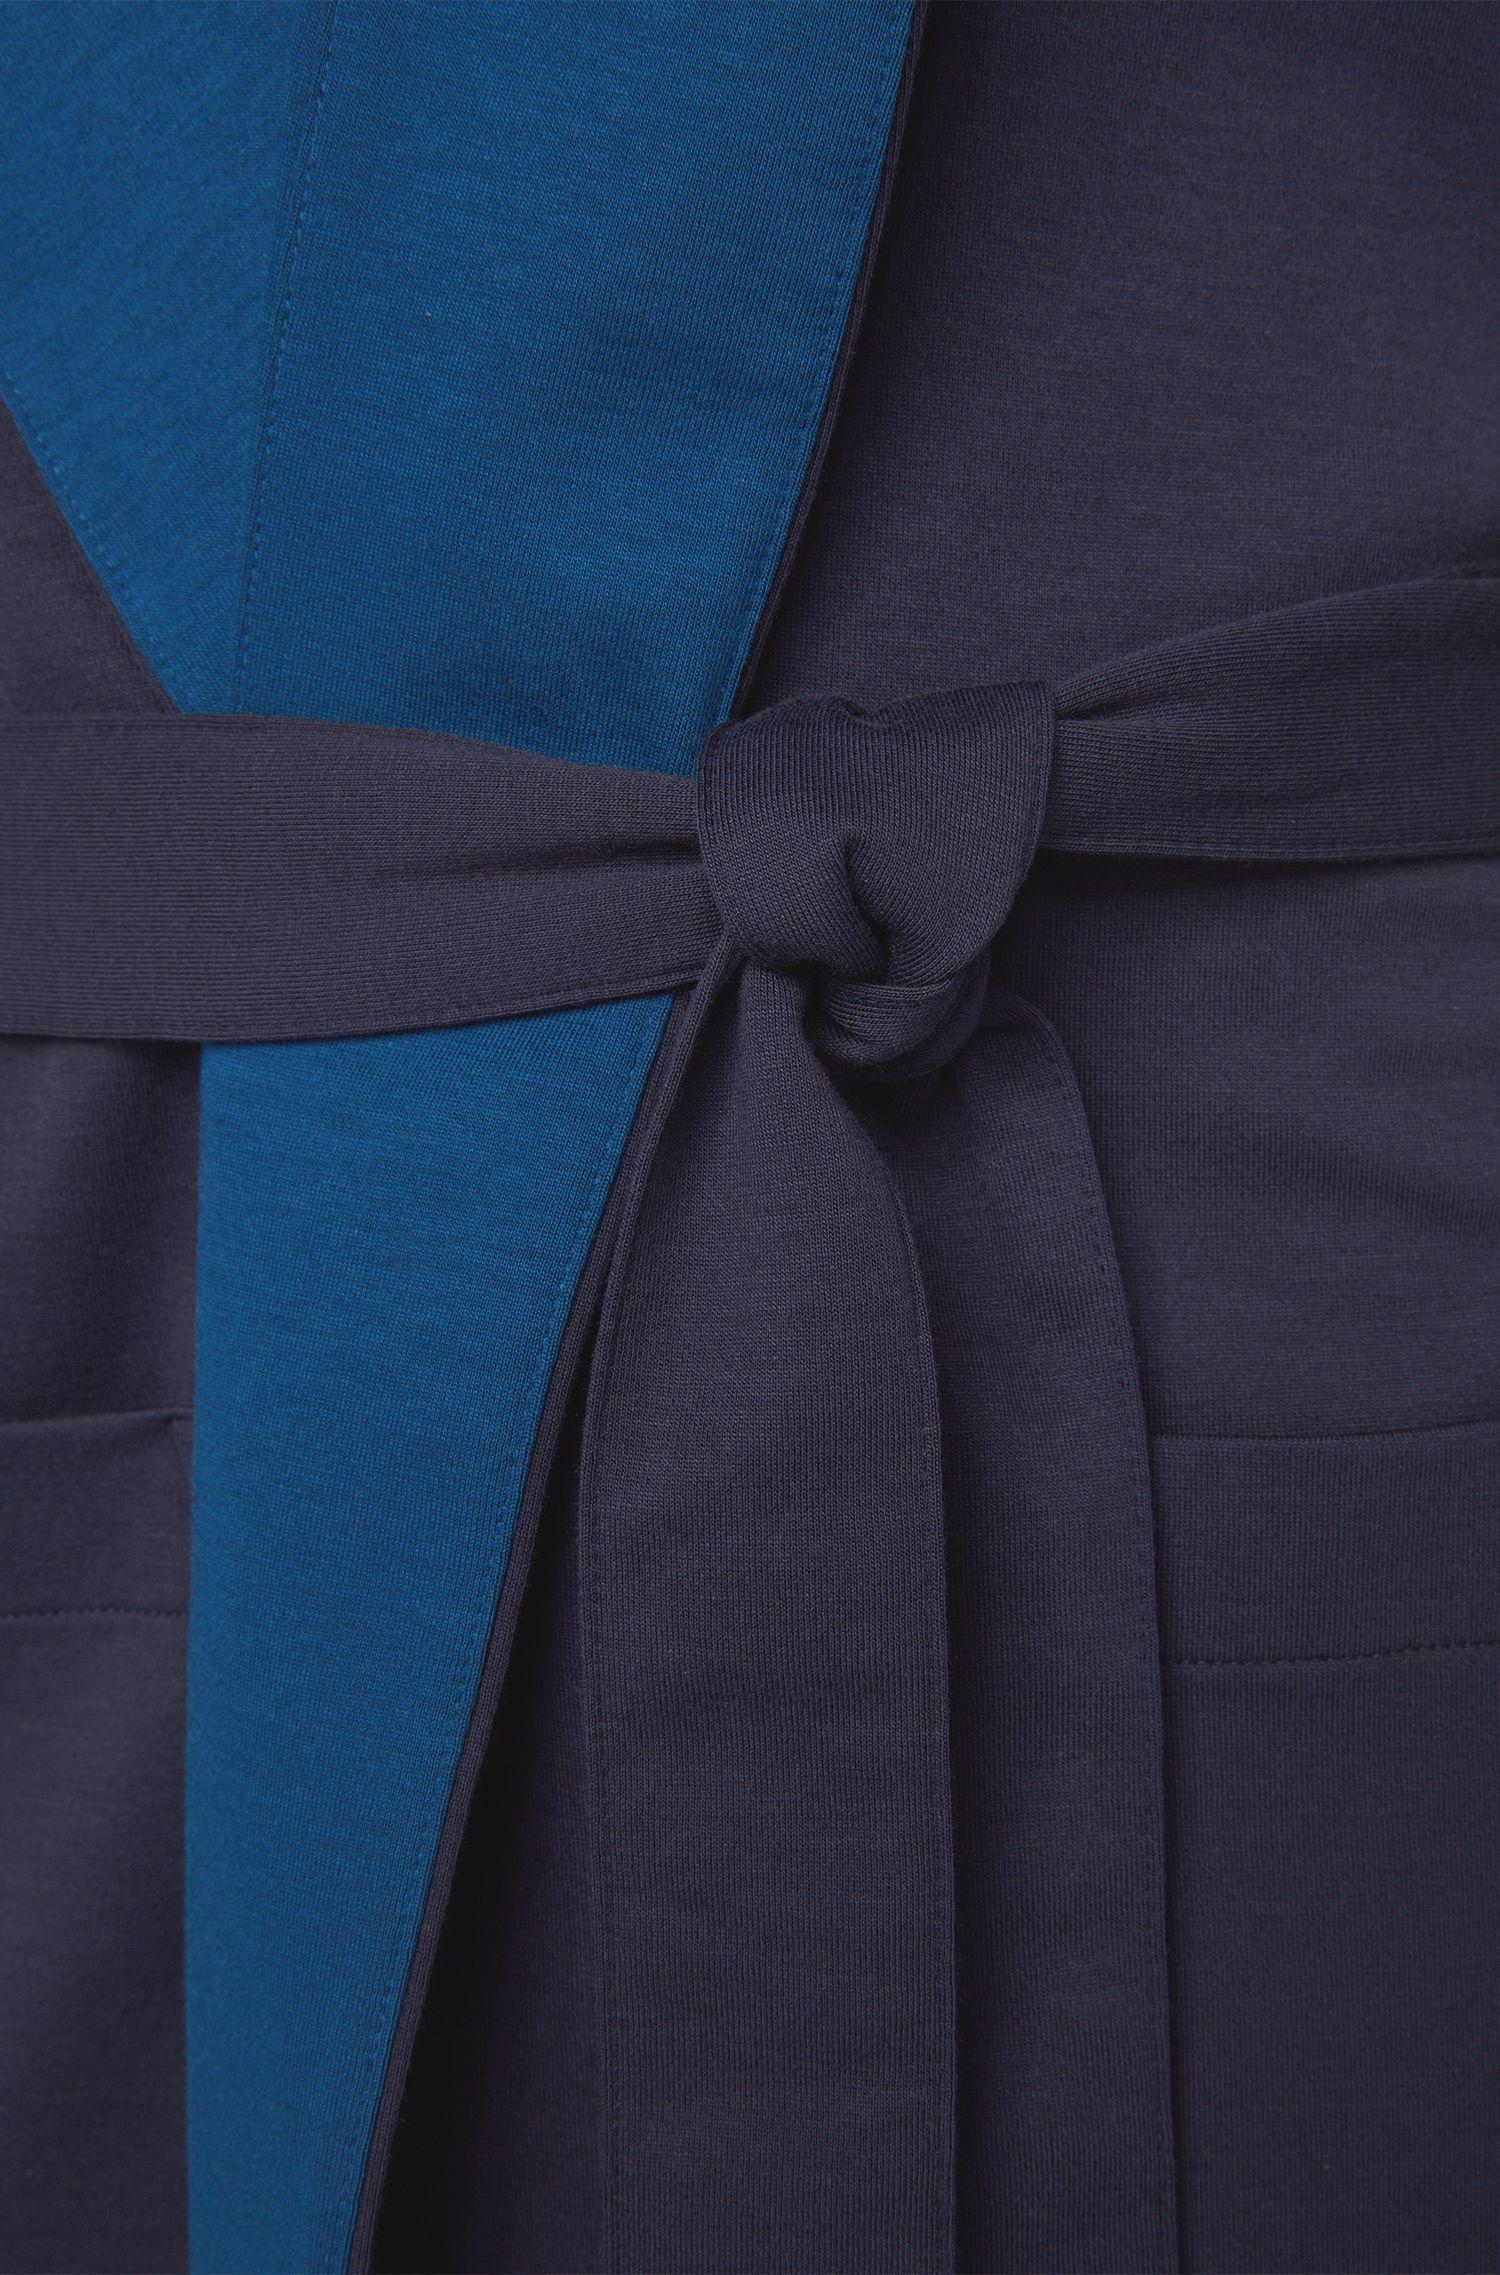 Morgenmantel aus Baumwoll-Mix mit Kapuze: 'Hooded Robe'